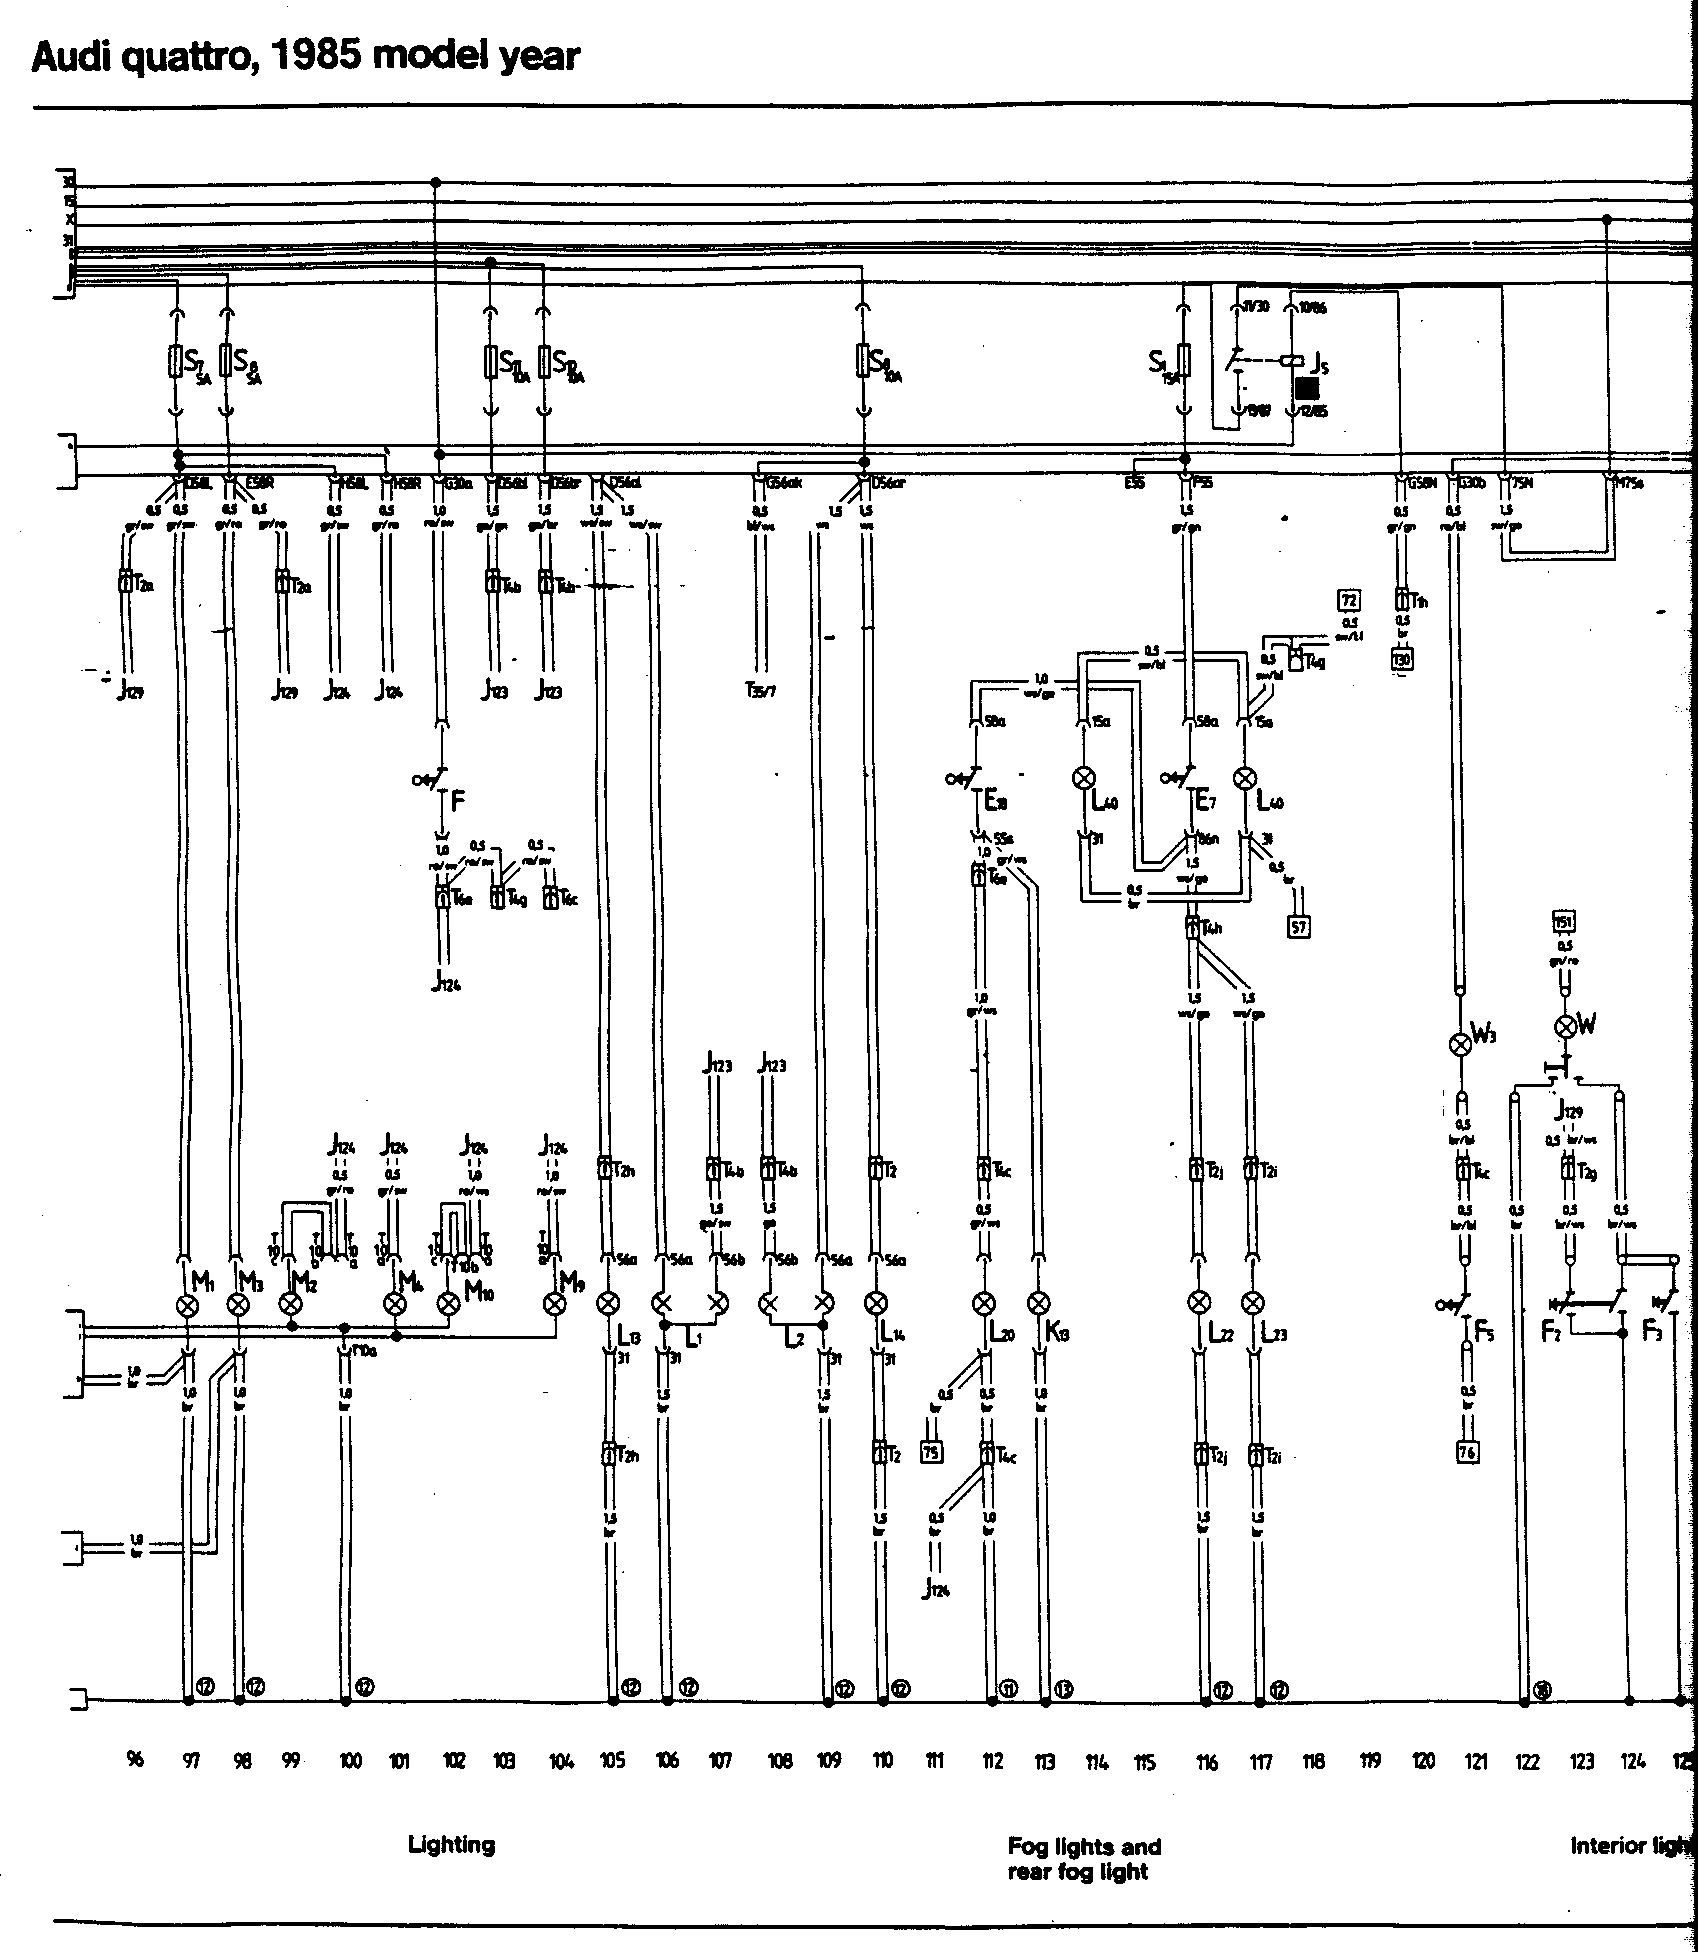 hight resolution of audi ur quattro 1985 wiring diagrams rh sealtd net audi quattro rally audi quattro rally